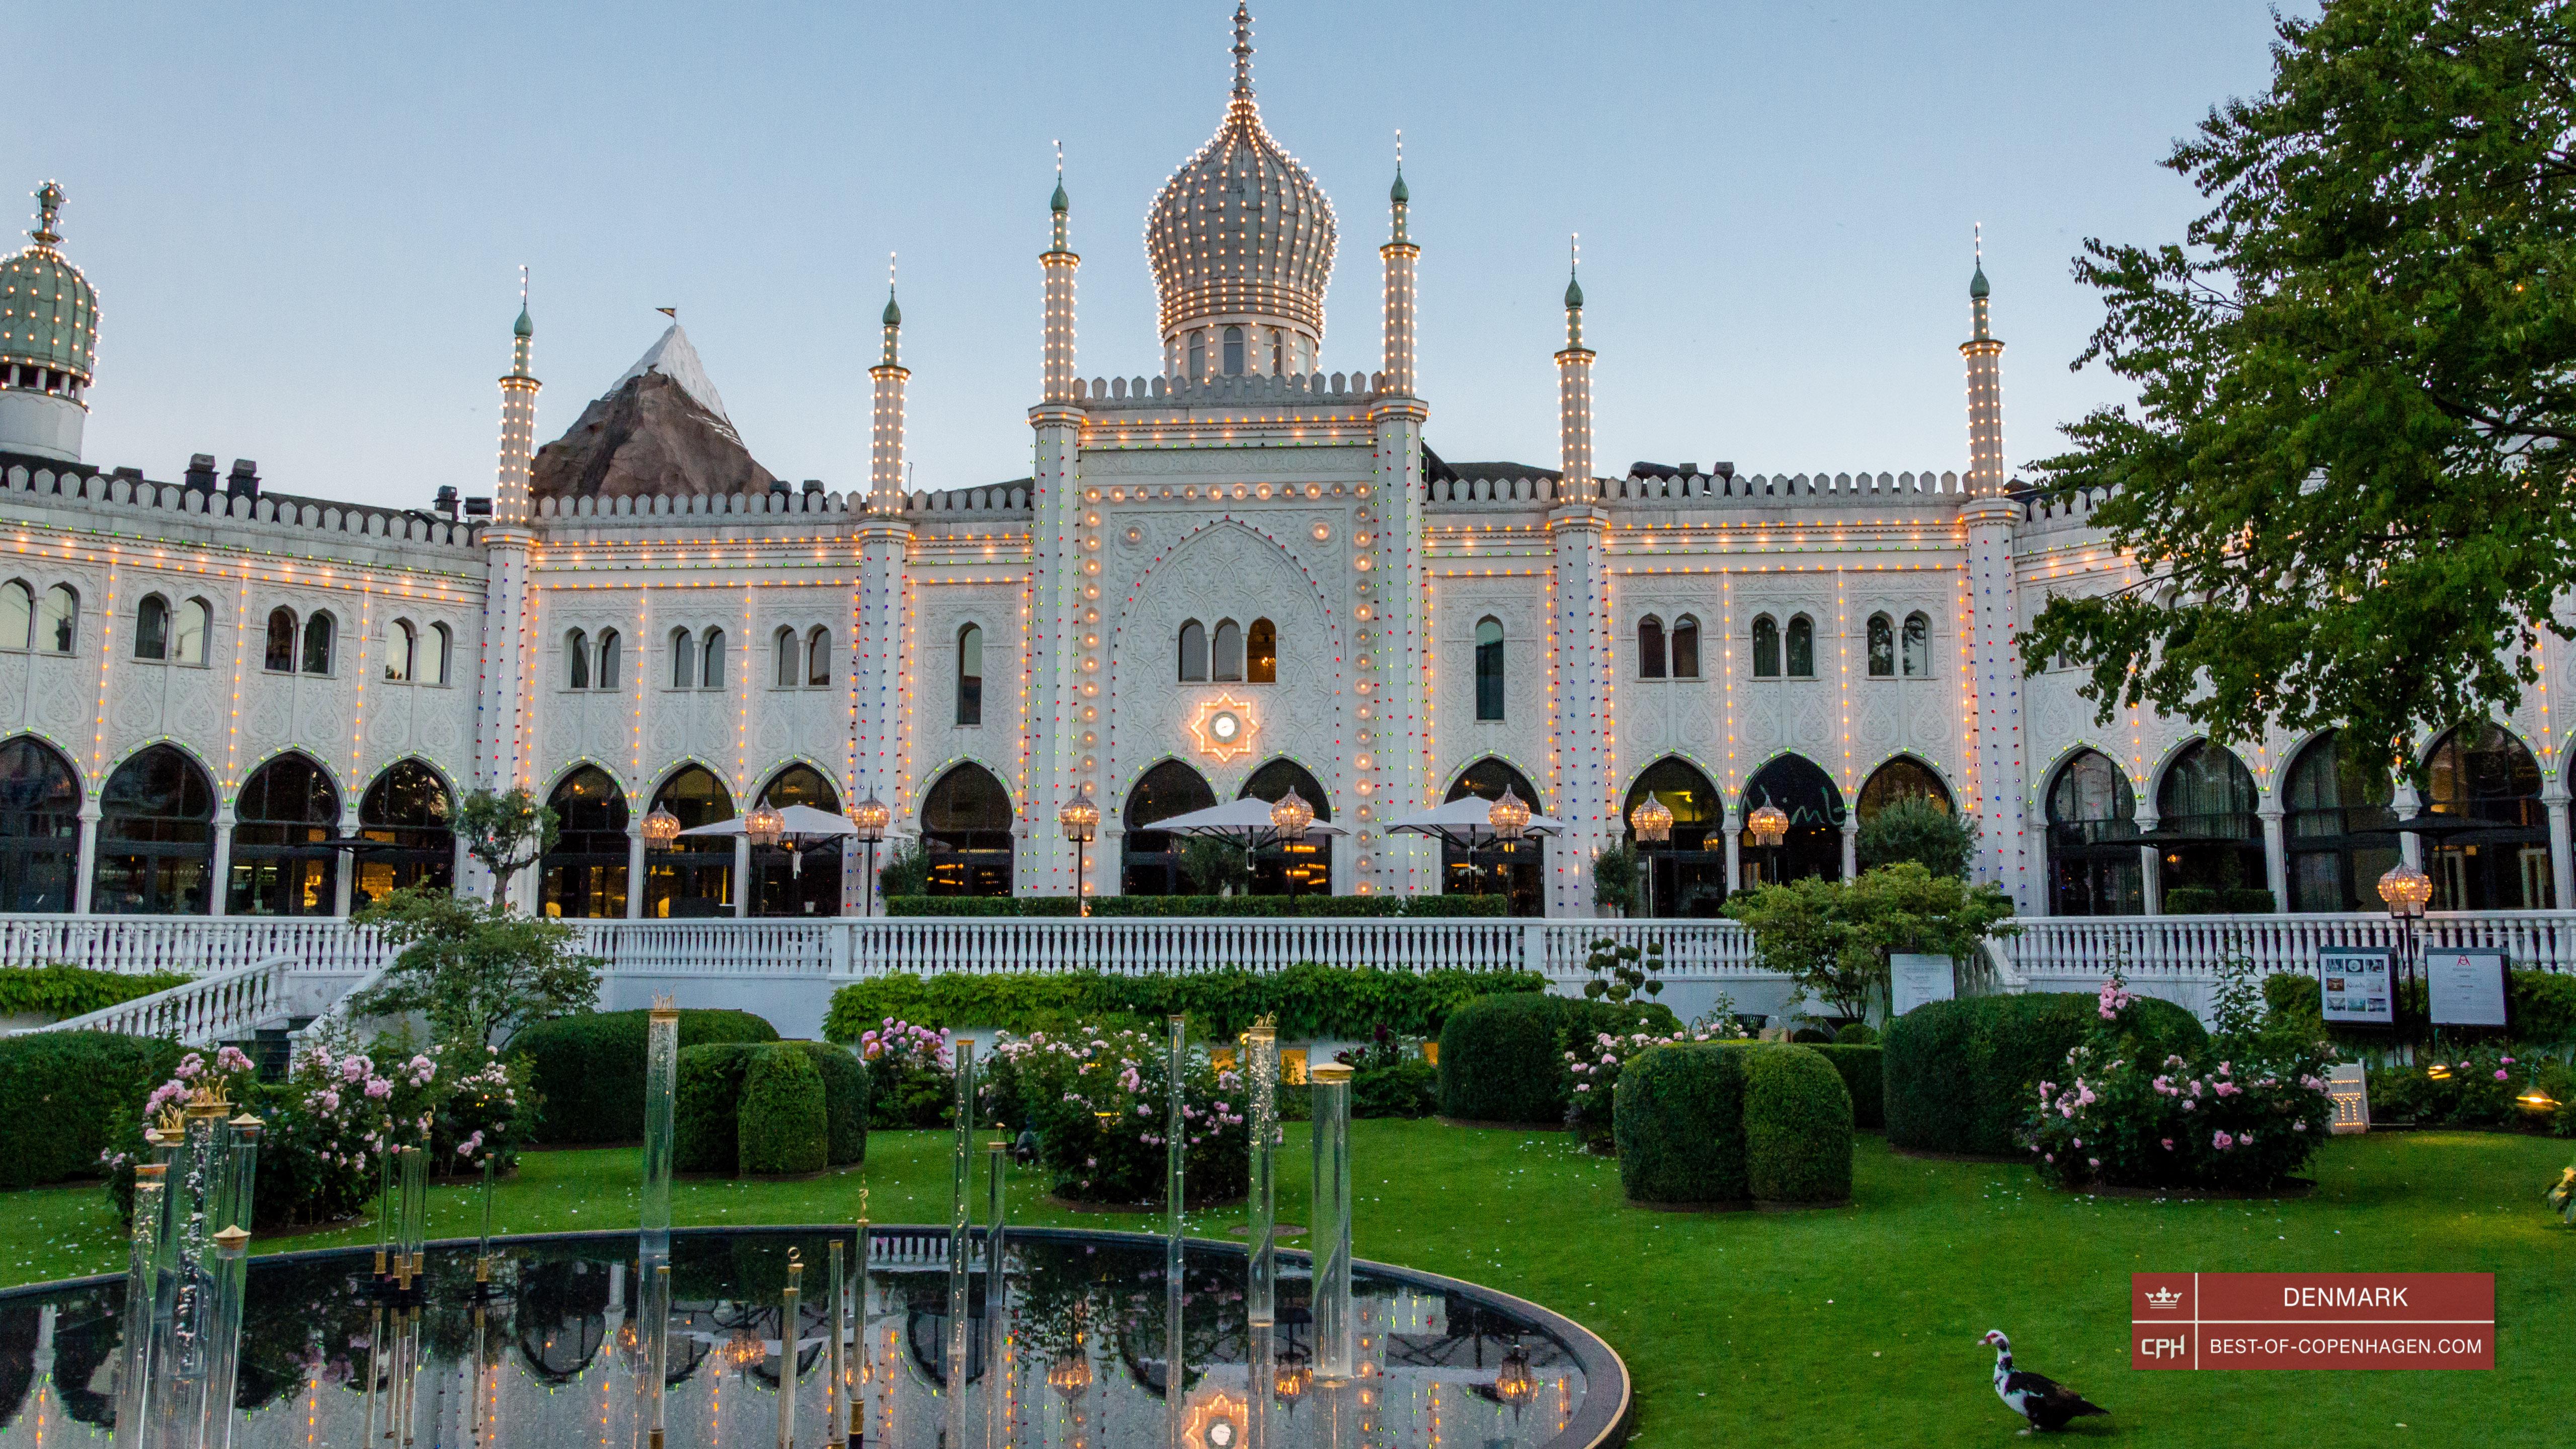 htel nimb dans les jardins de tivoli - Jardins De Tivoli